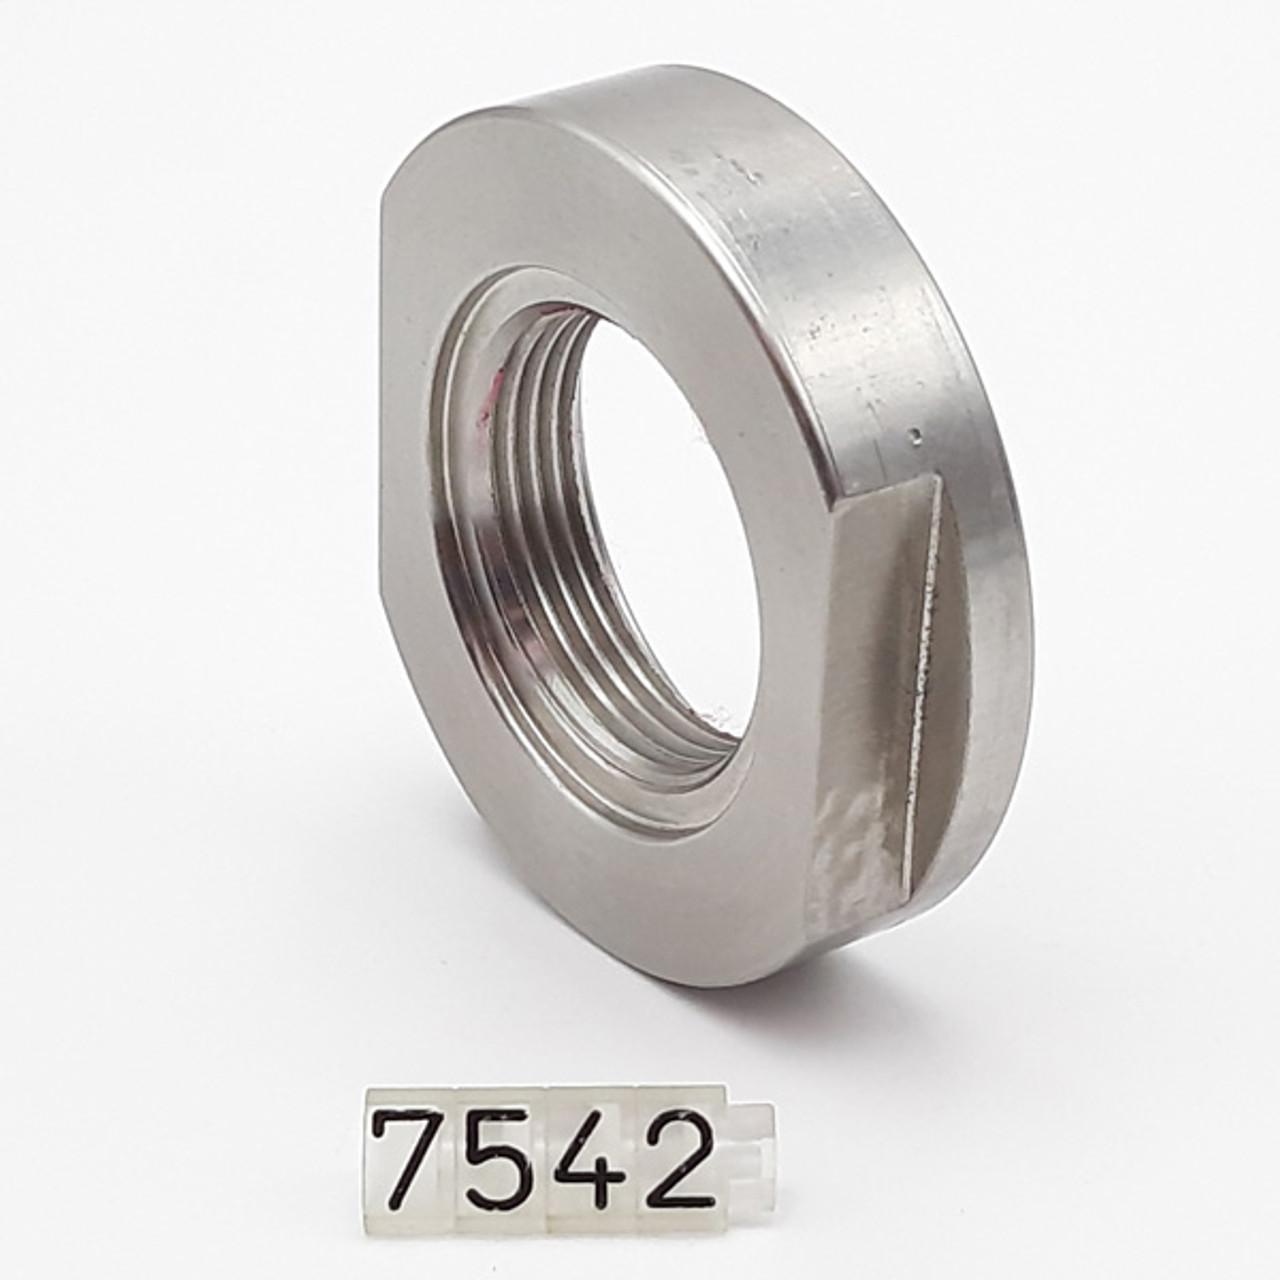 Talsa K-648 - K15e & K15v - Knife Fixing Nut - 7542